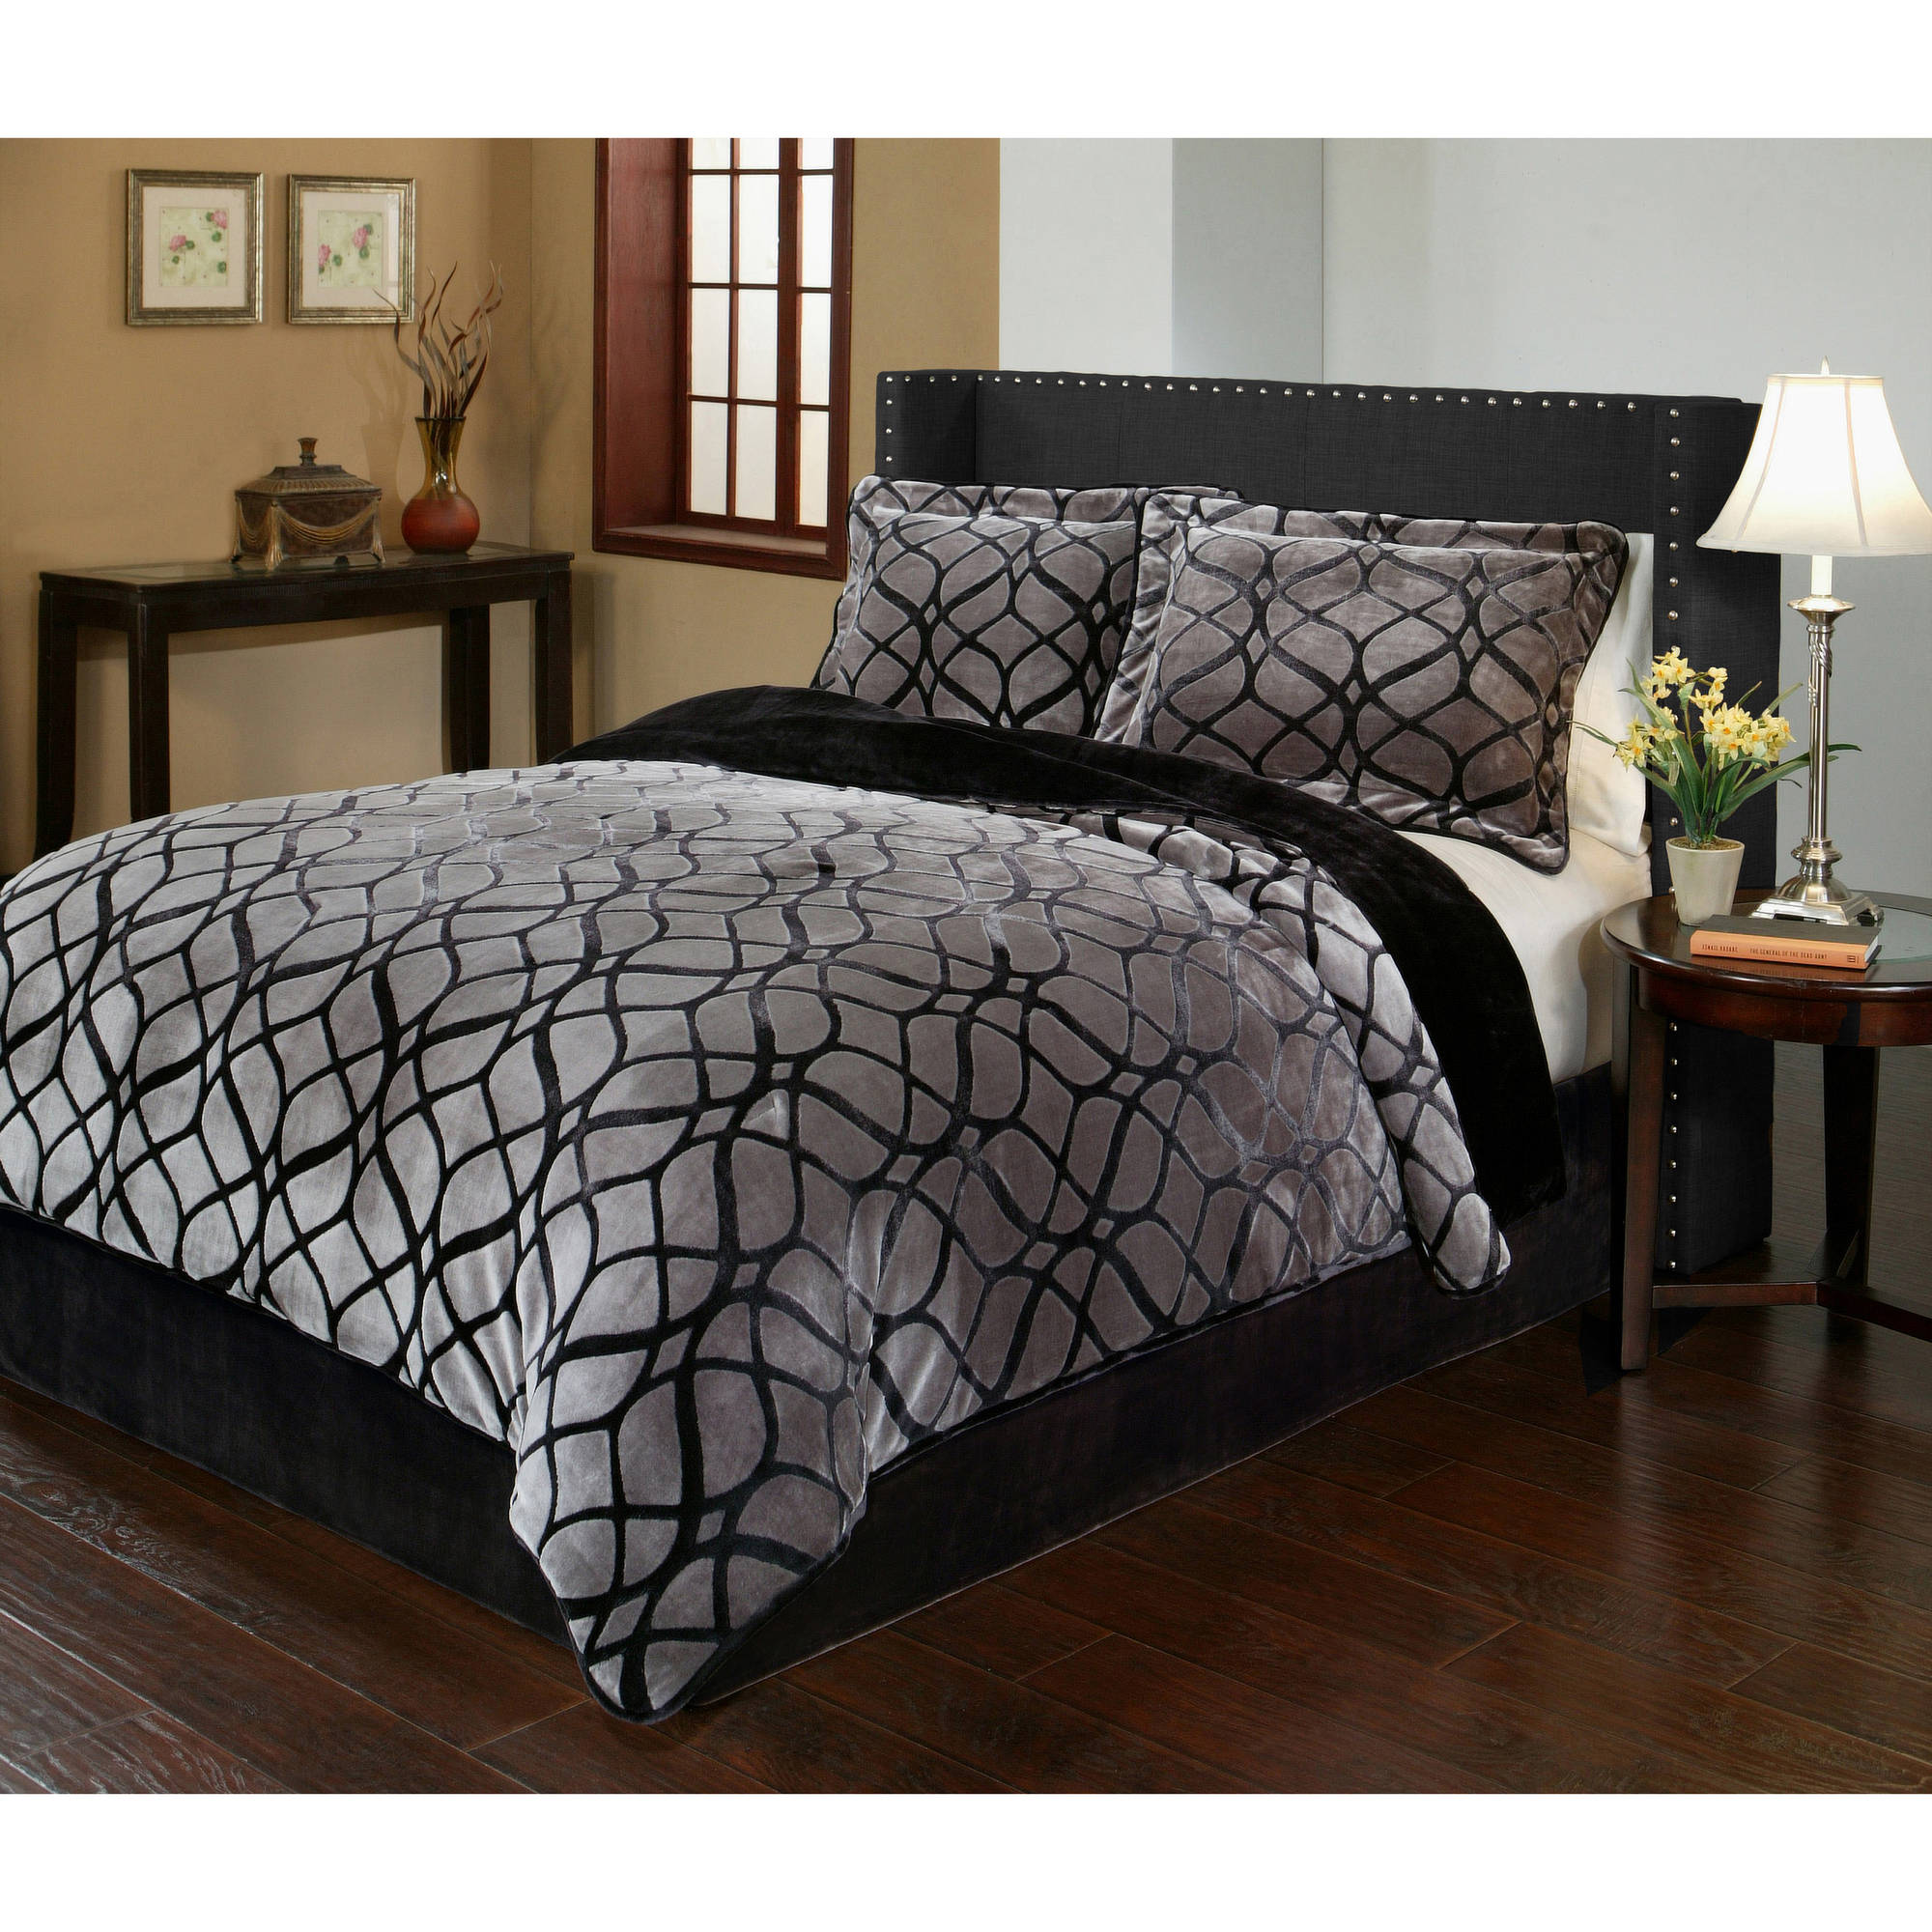 Matrix Velvet Plush Print Bedding Comforter Mini Set By